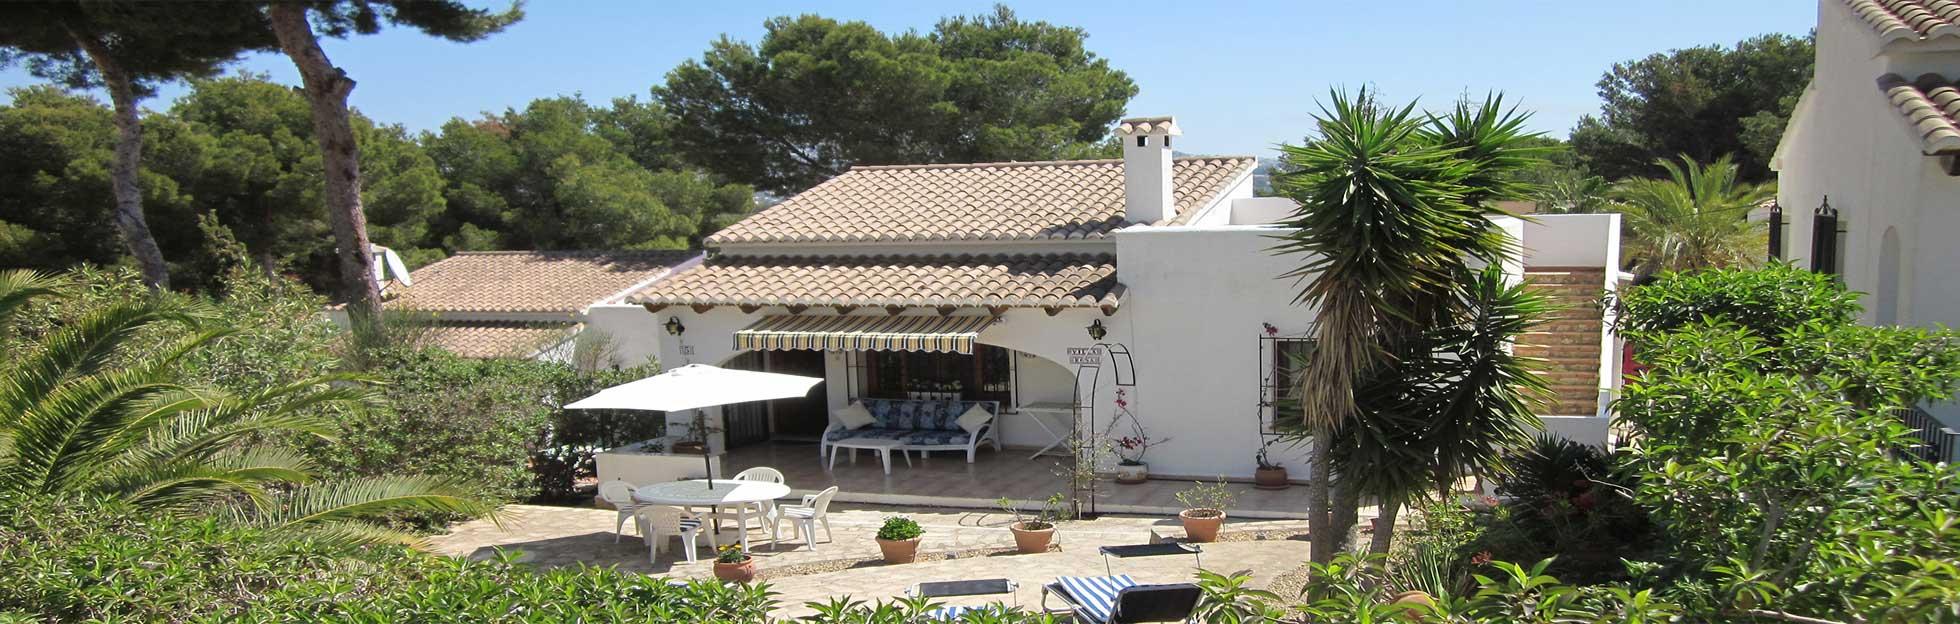 villa rosa holiday villa in moraira. Black Bedroom Furniture Sets. Home Design Ideas